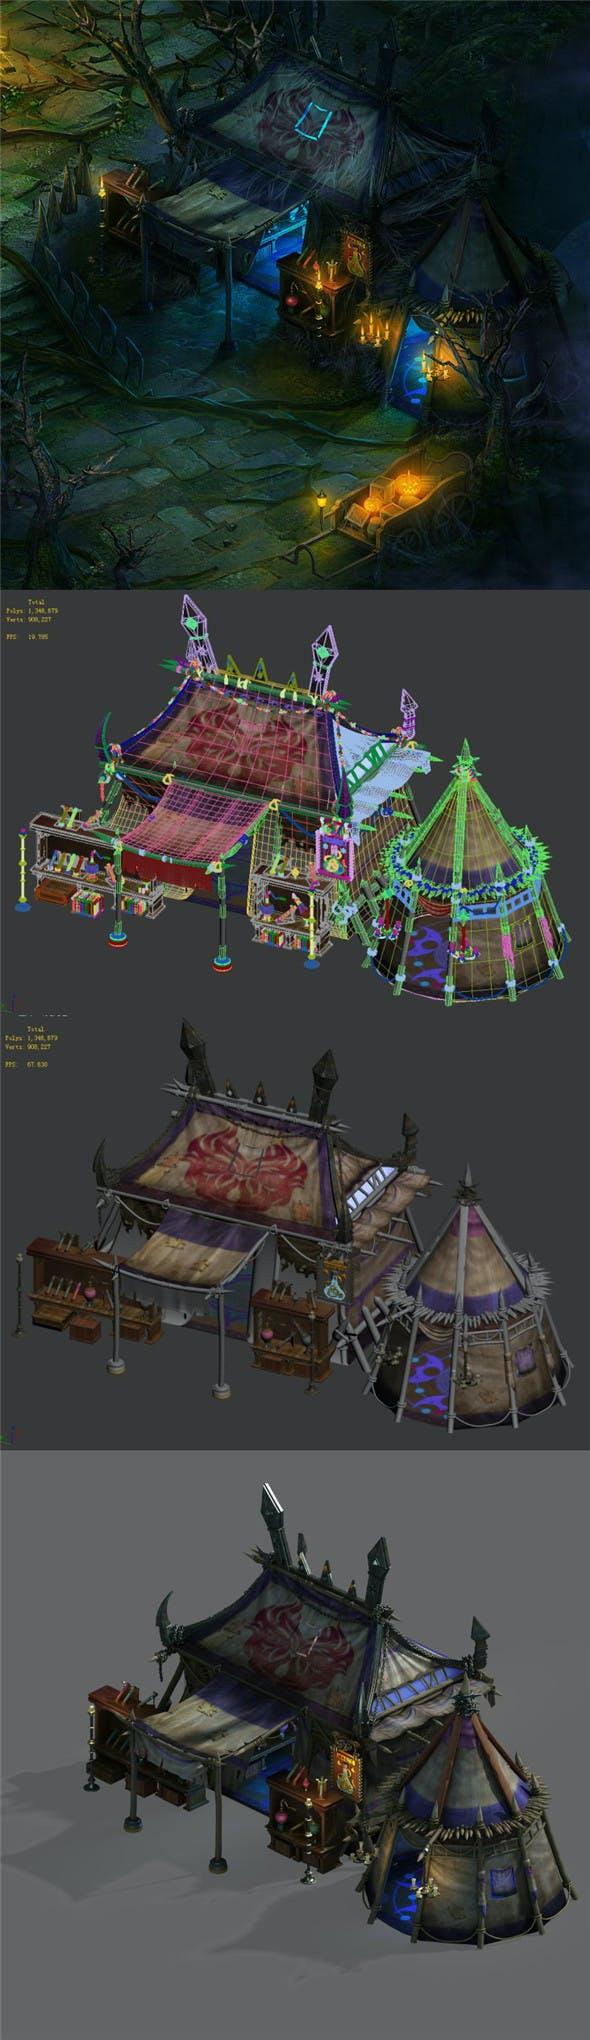 Dark forest - tent - 3DOcean Item for Sale